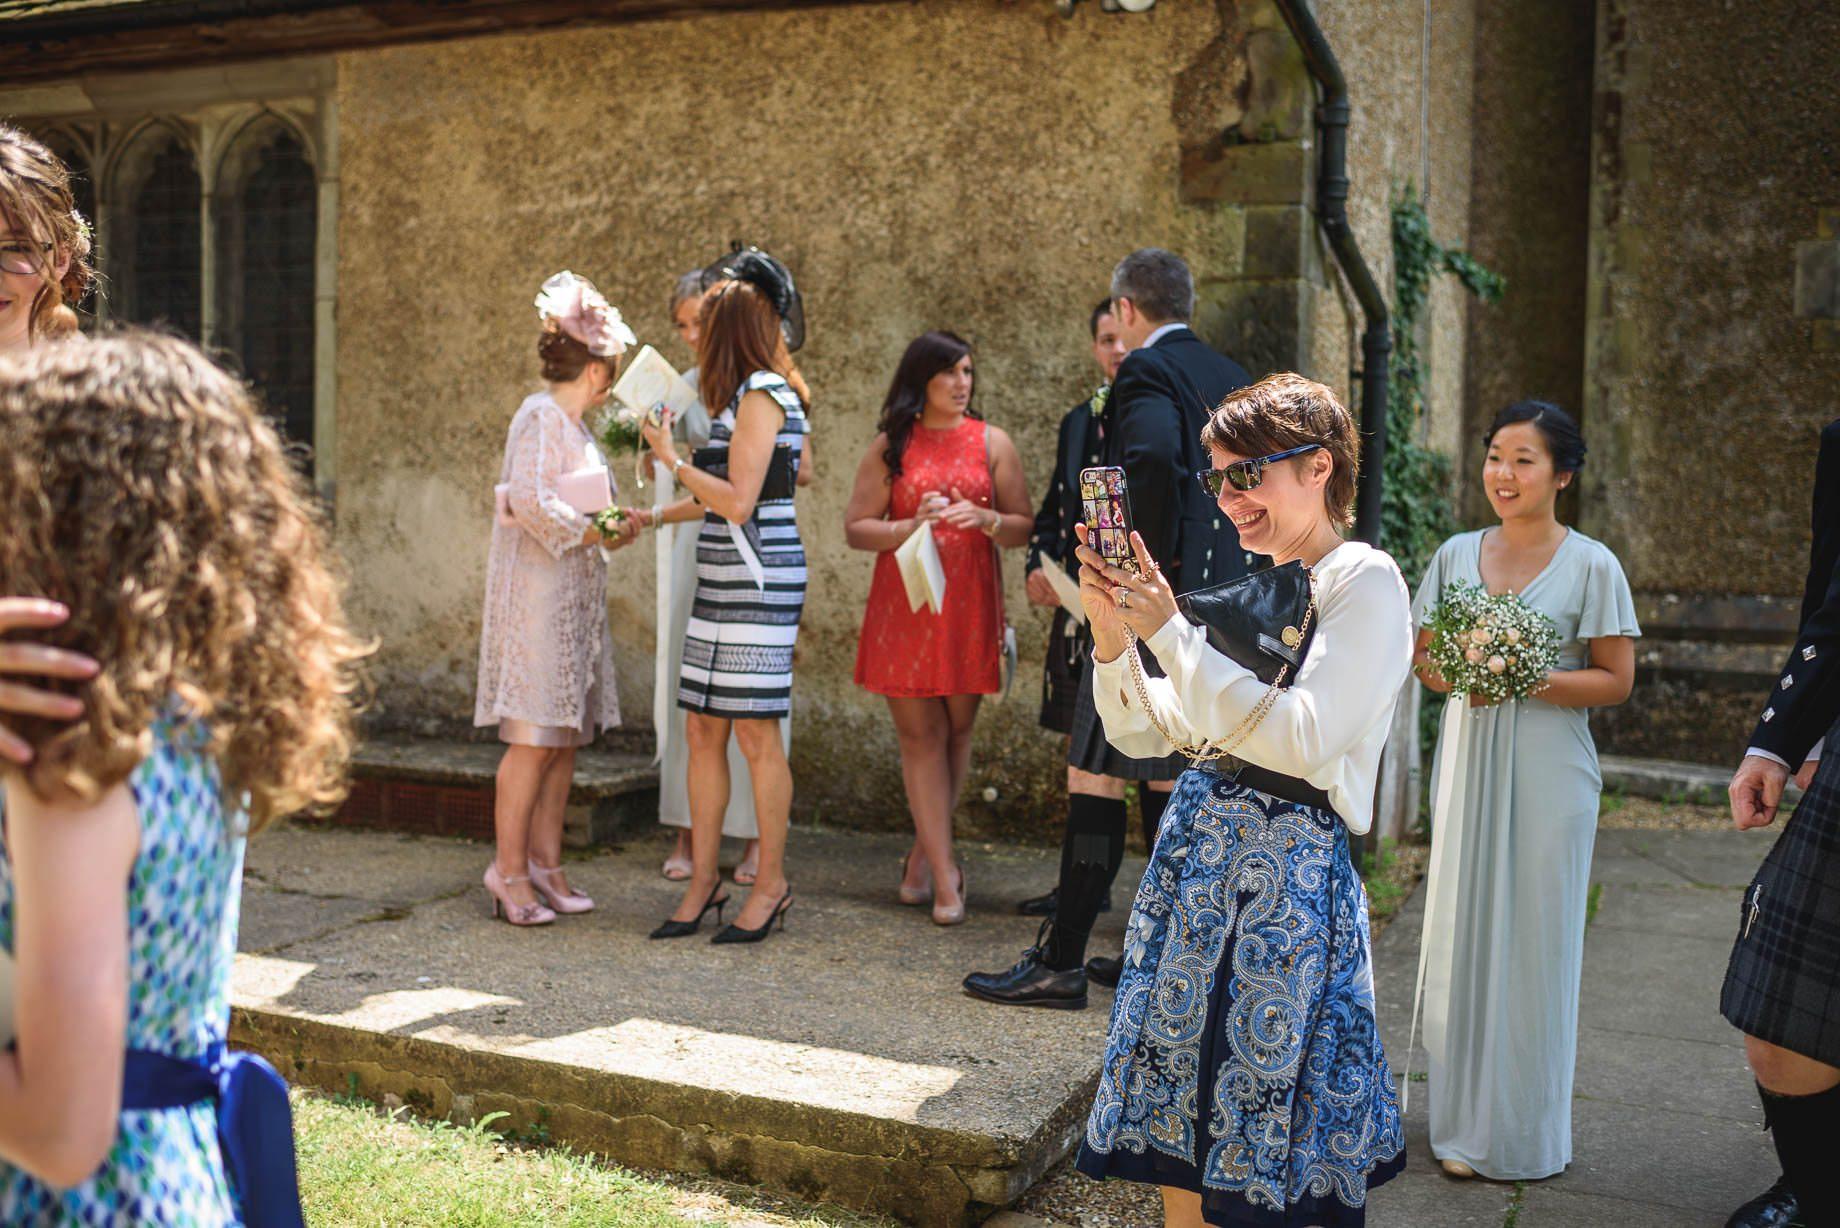 Gildings Barn wedding photography - Sarah and Steve (73 of 190)